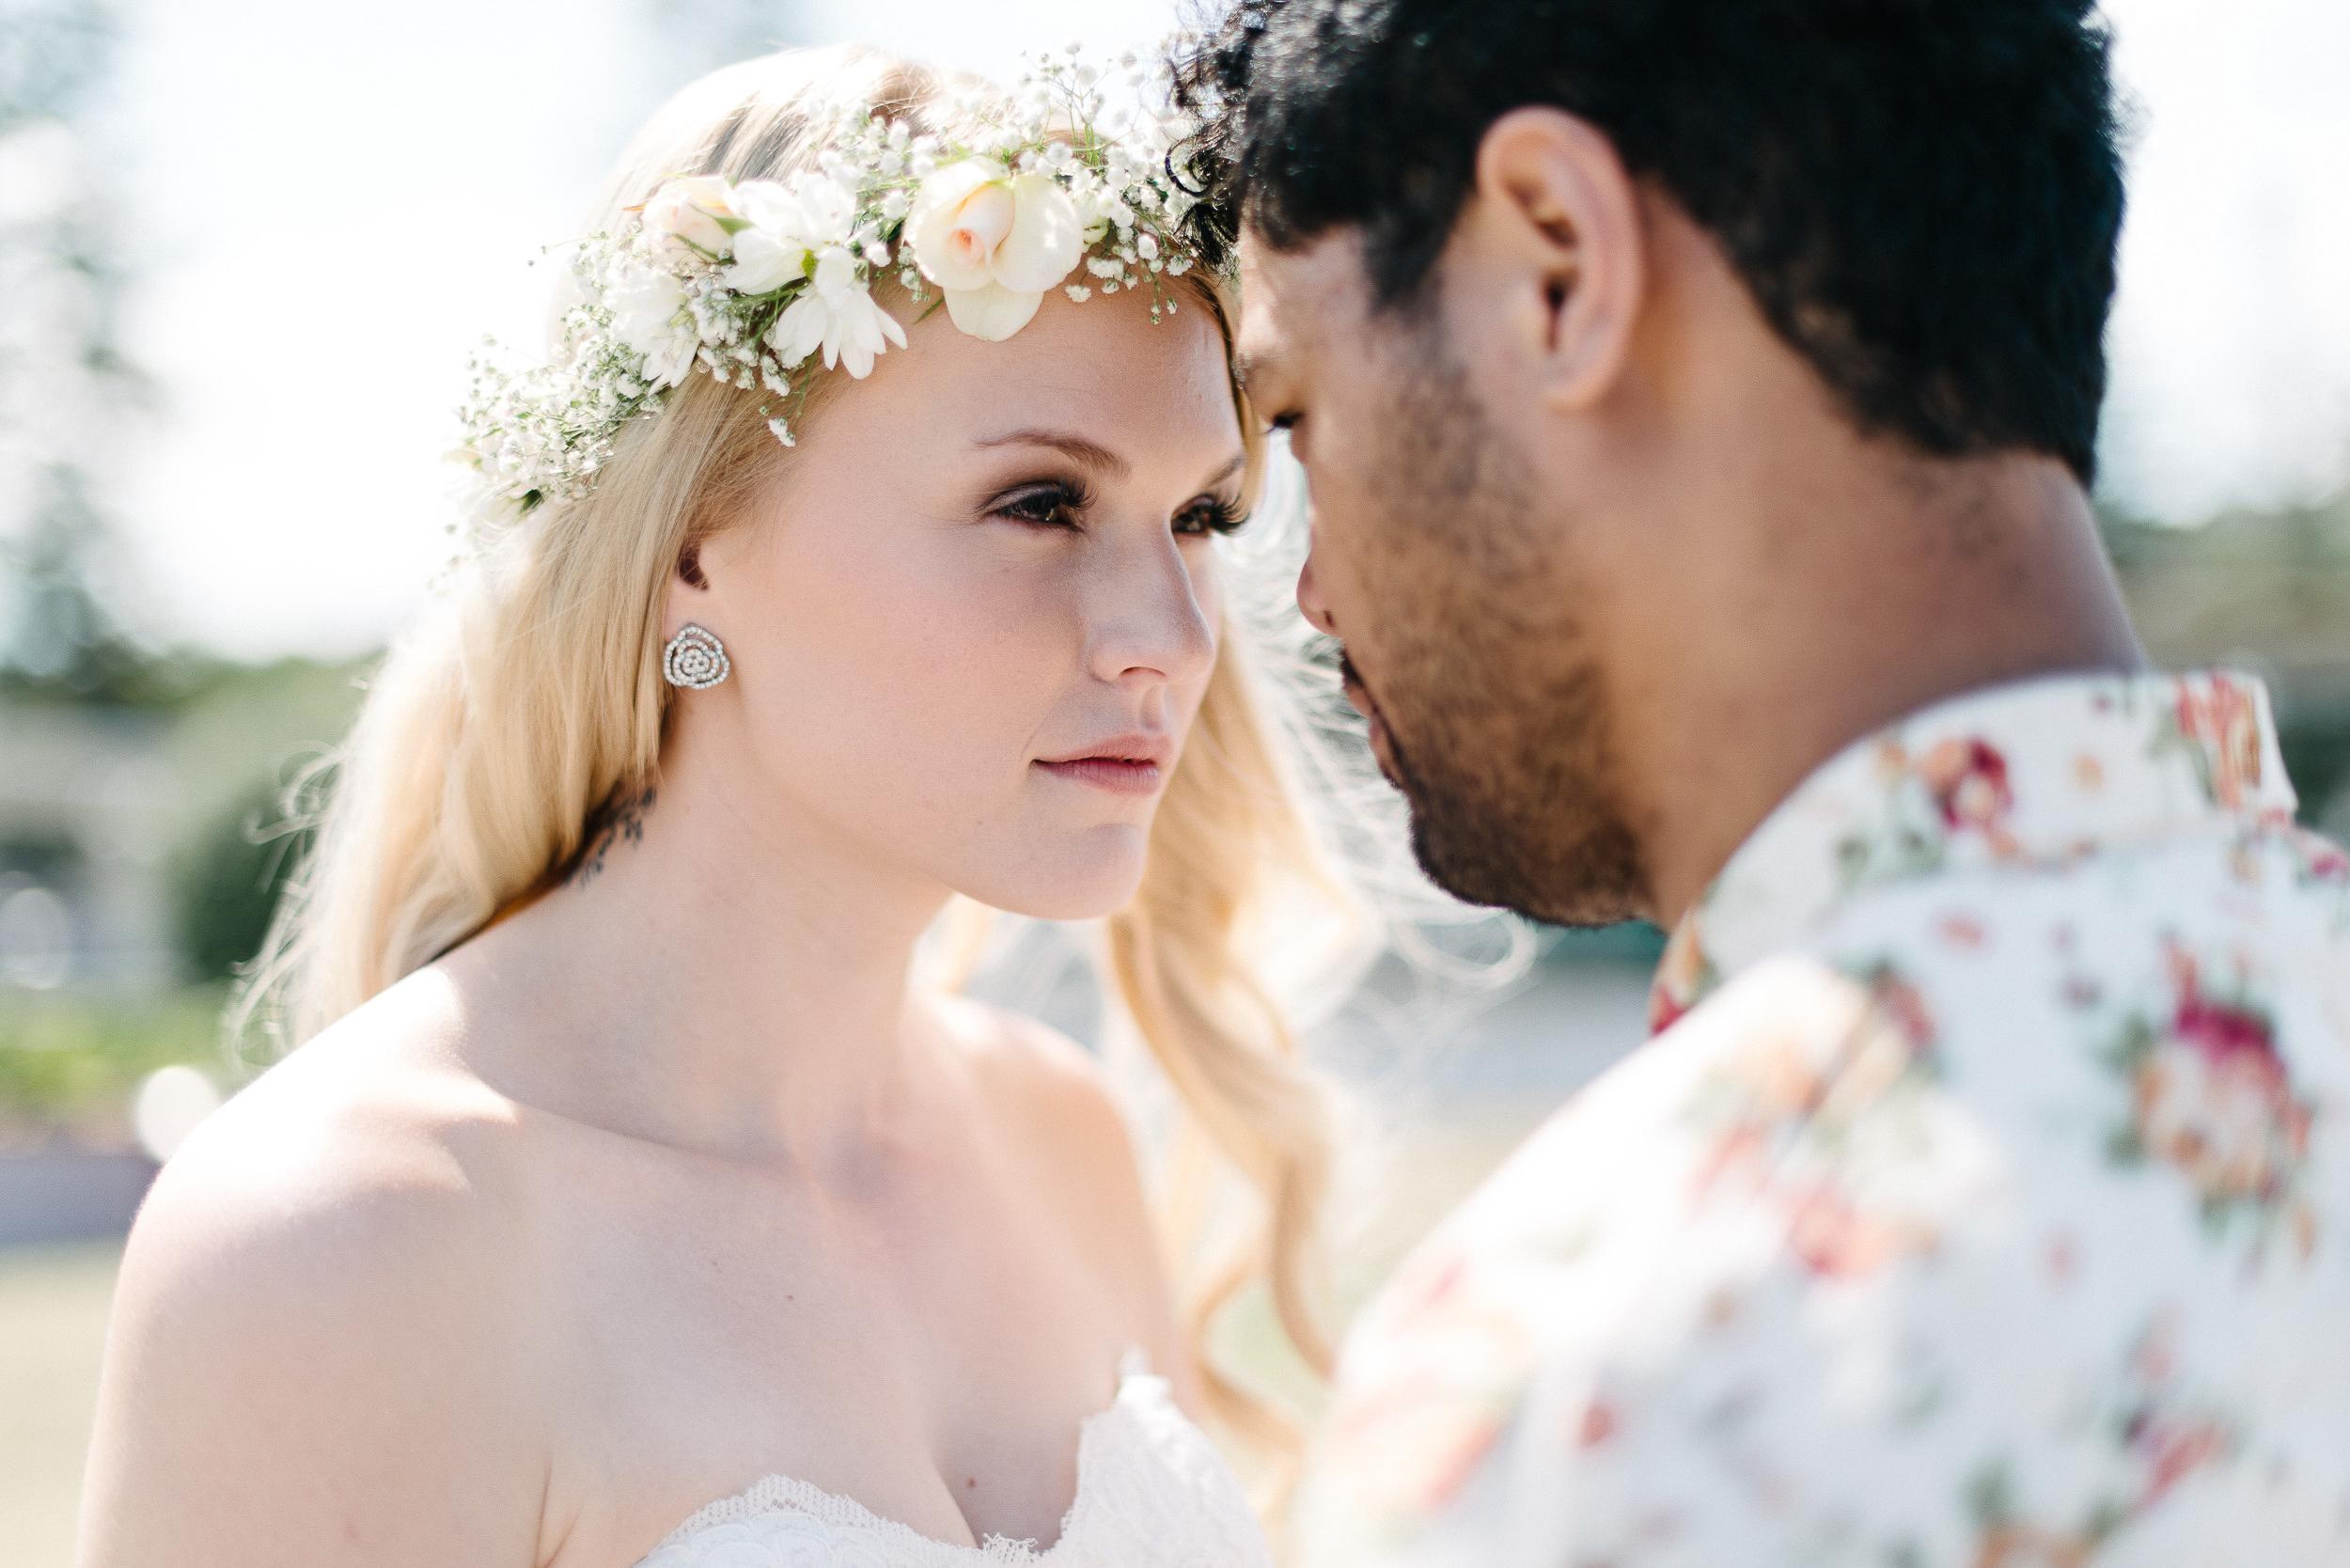 New-Zealand-Wedding-Photographer-15.jpg